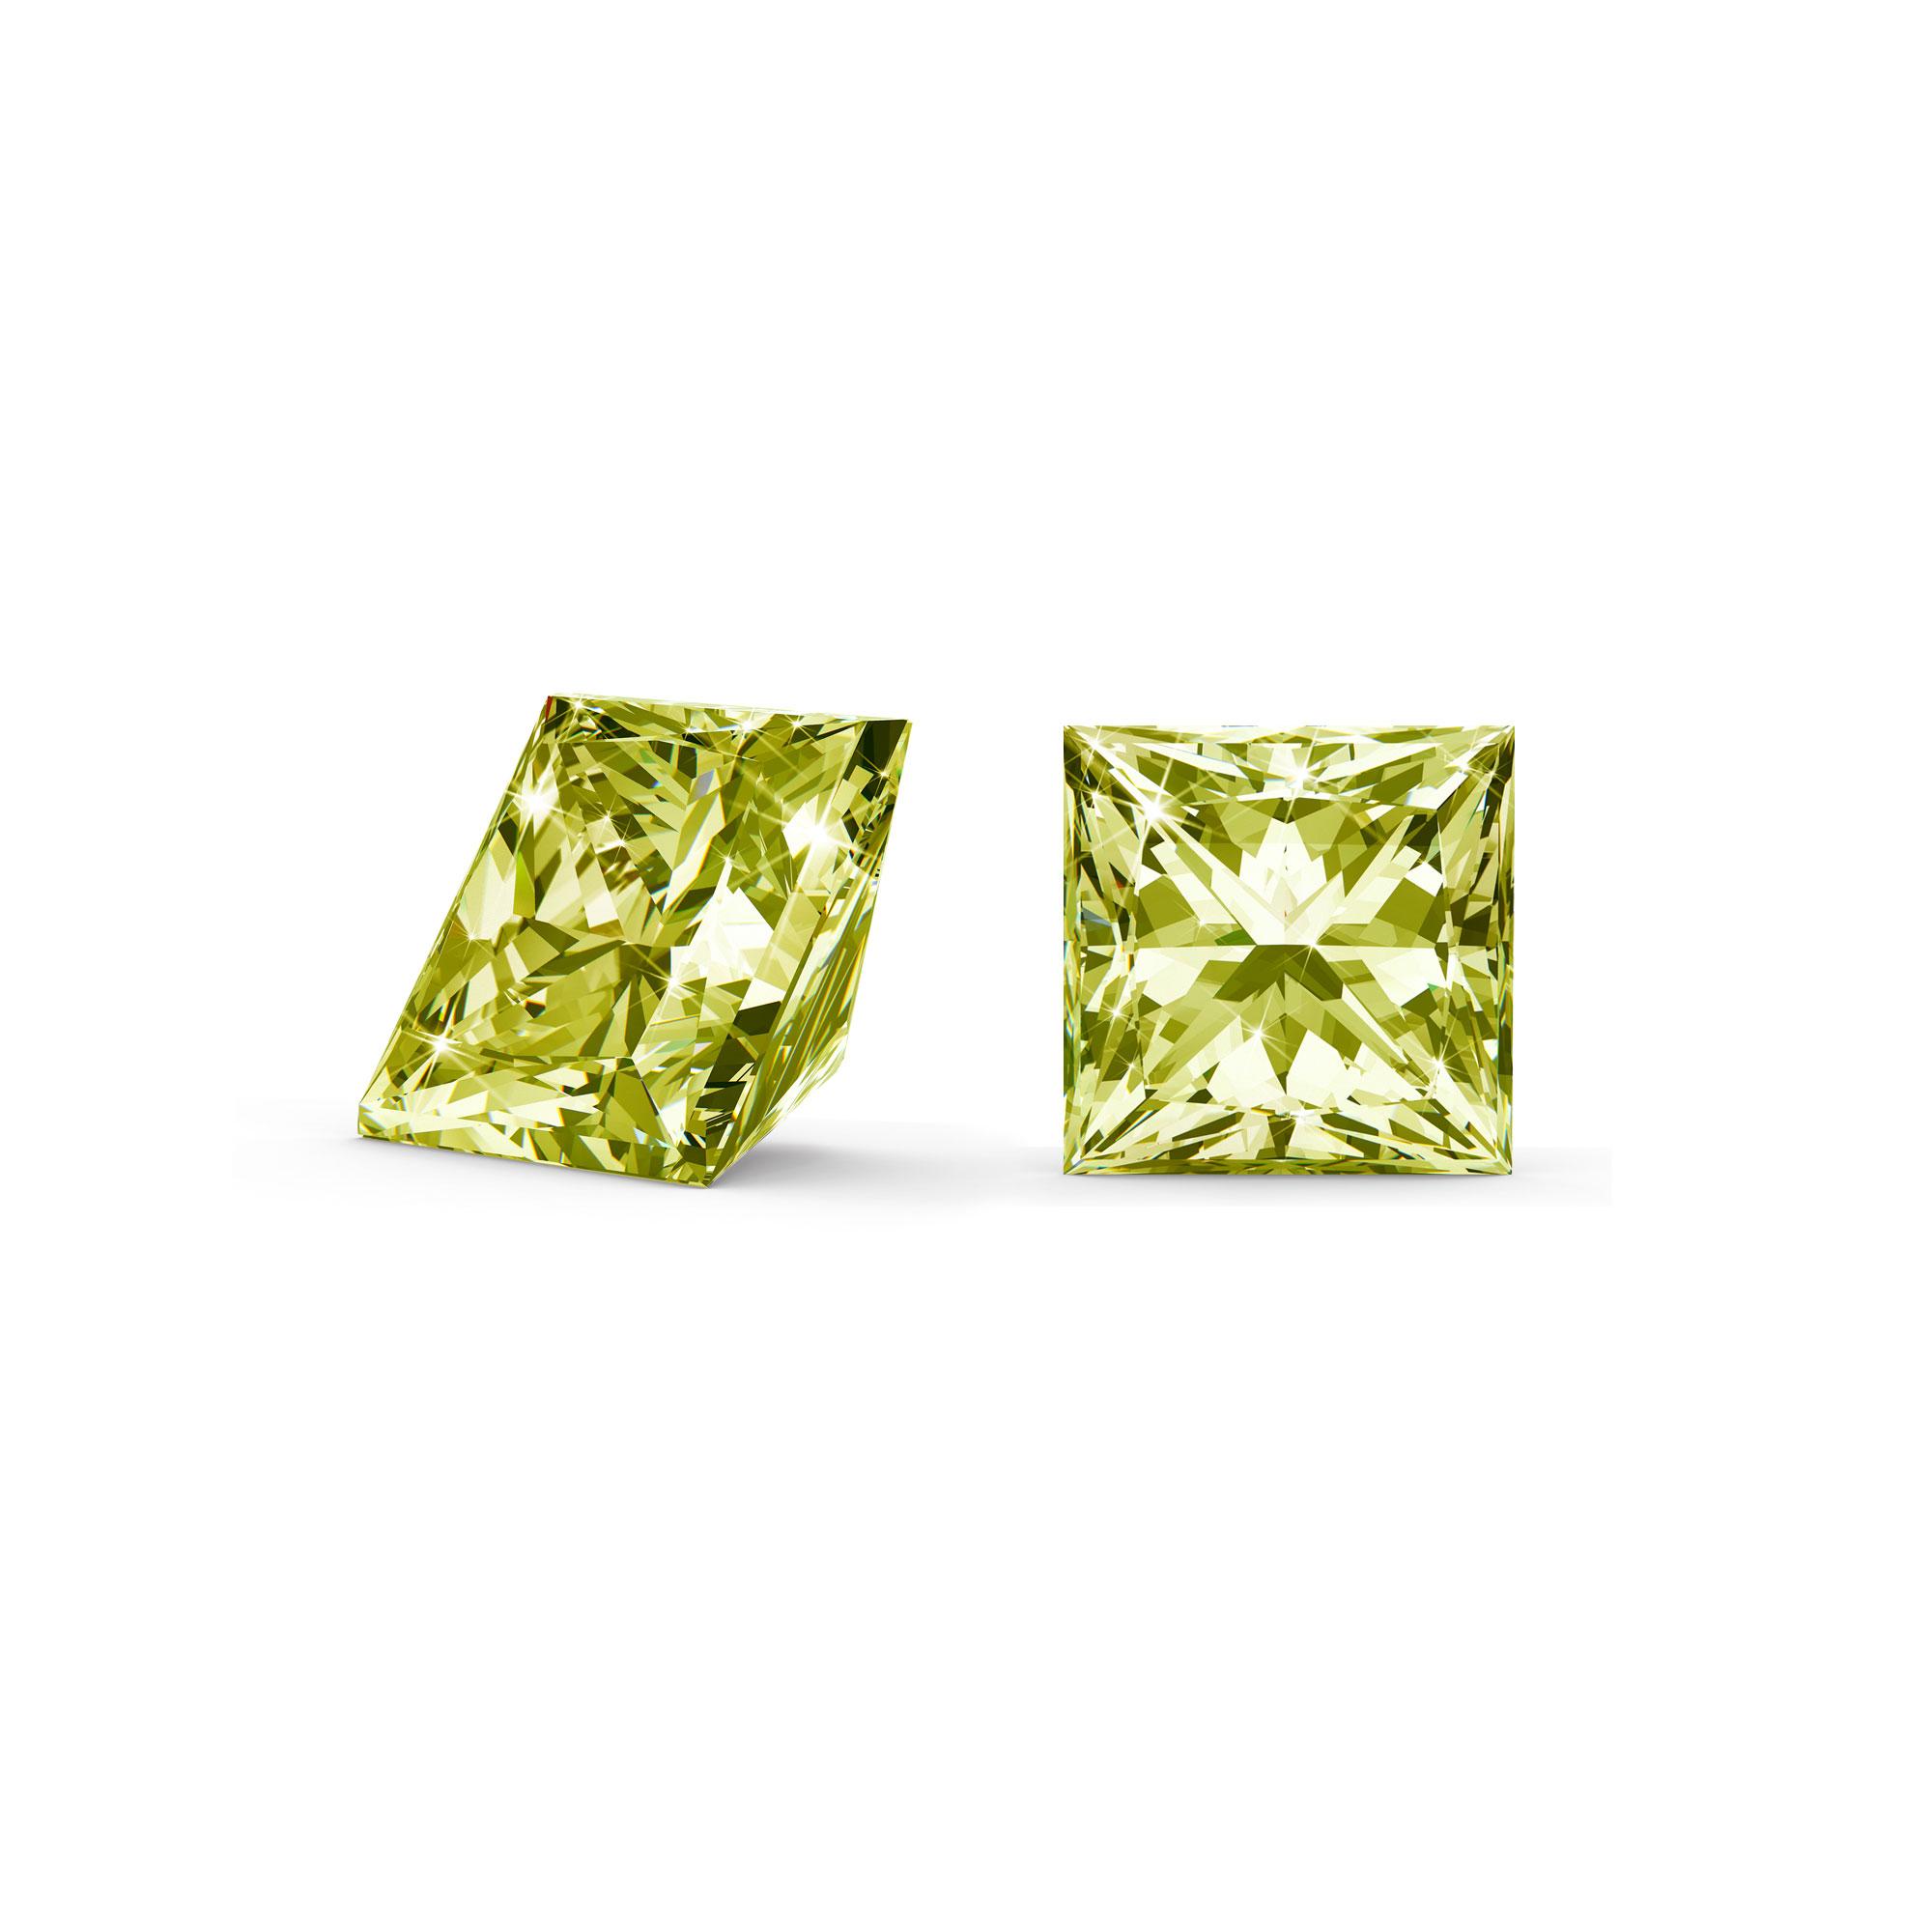 Grøn/gul diamant princess cut side og top